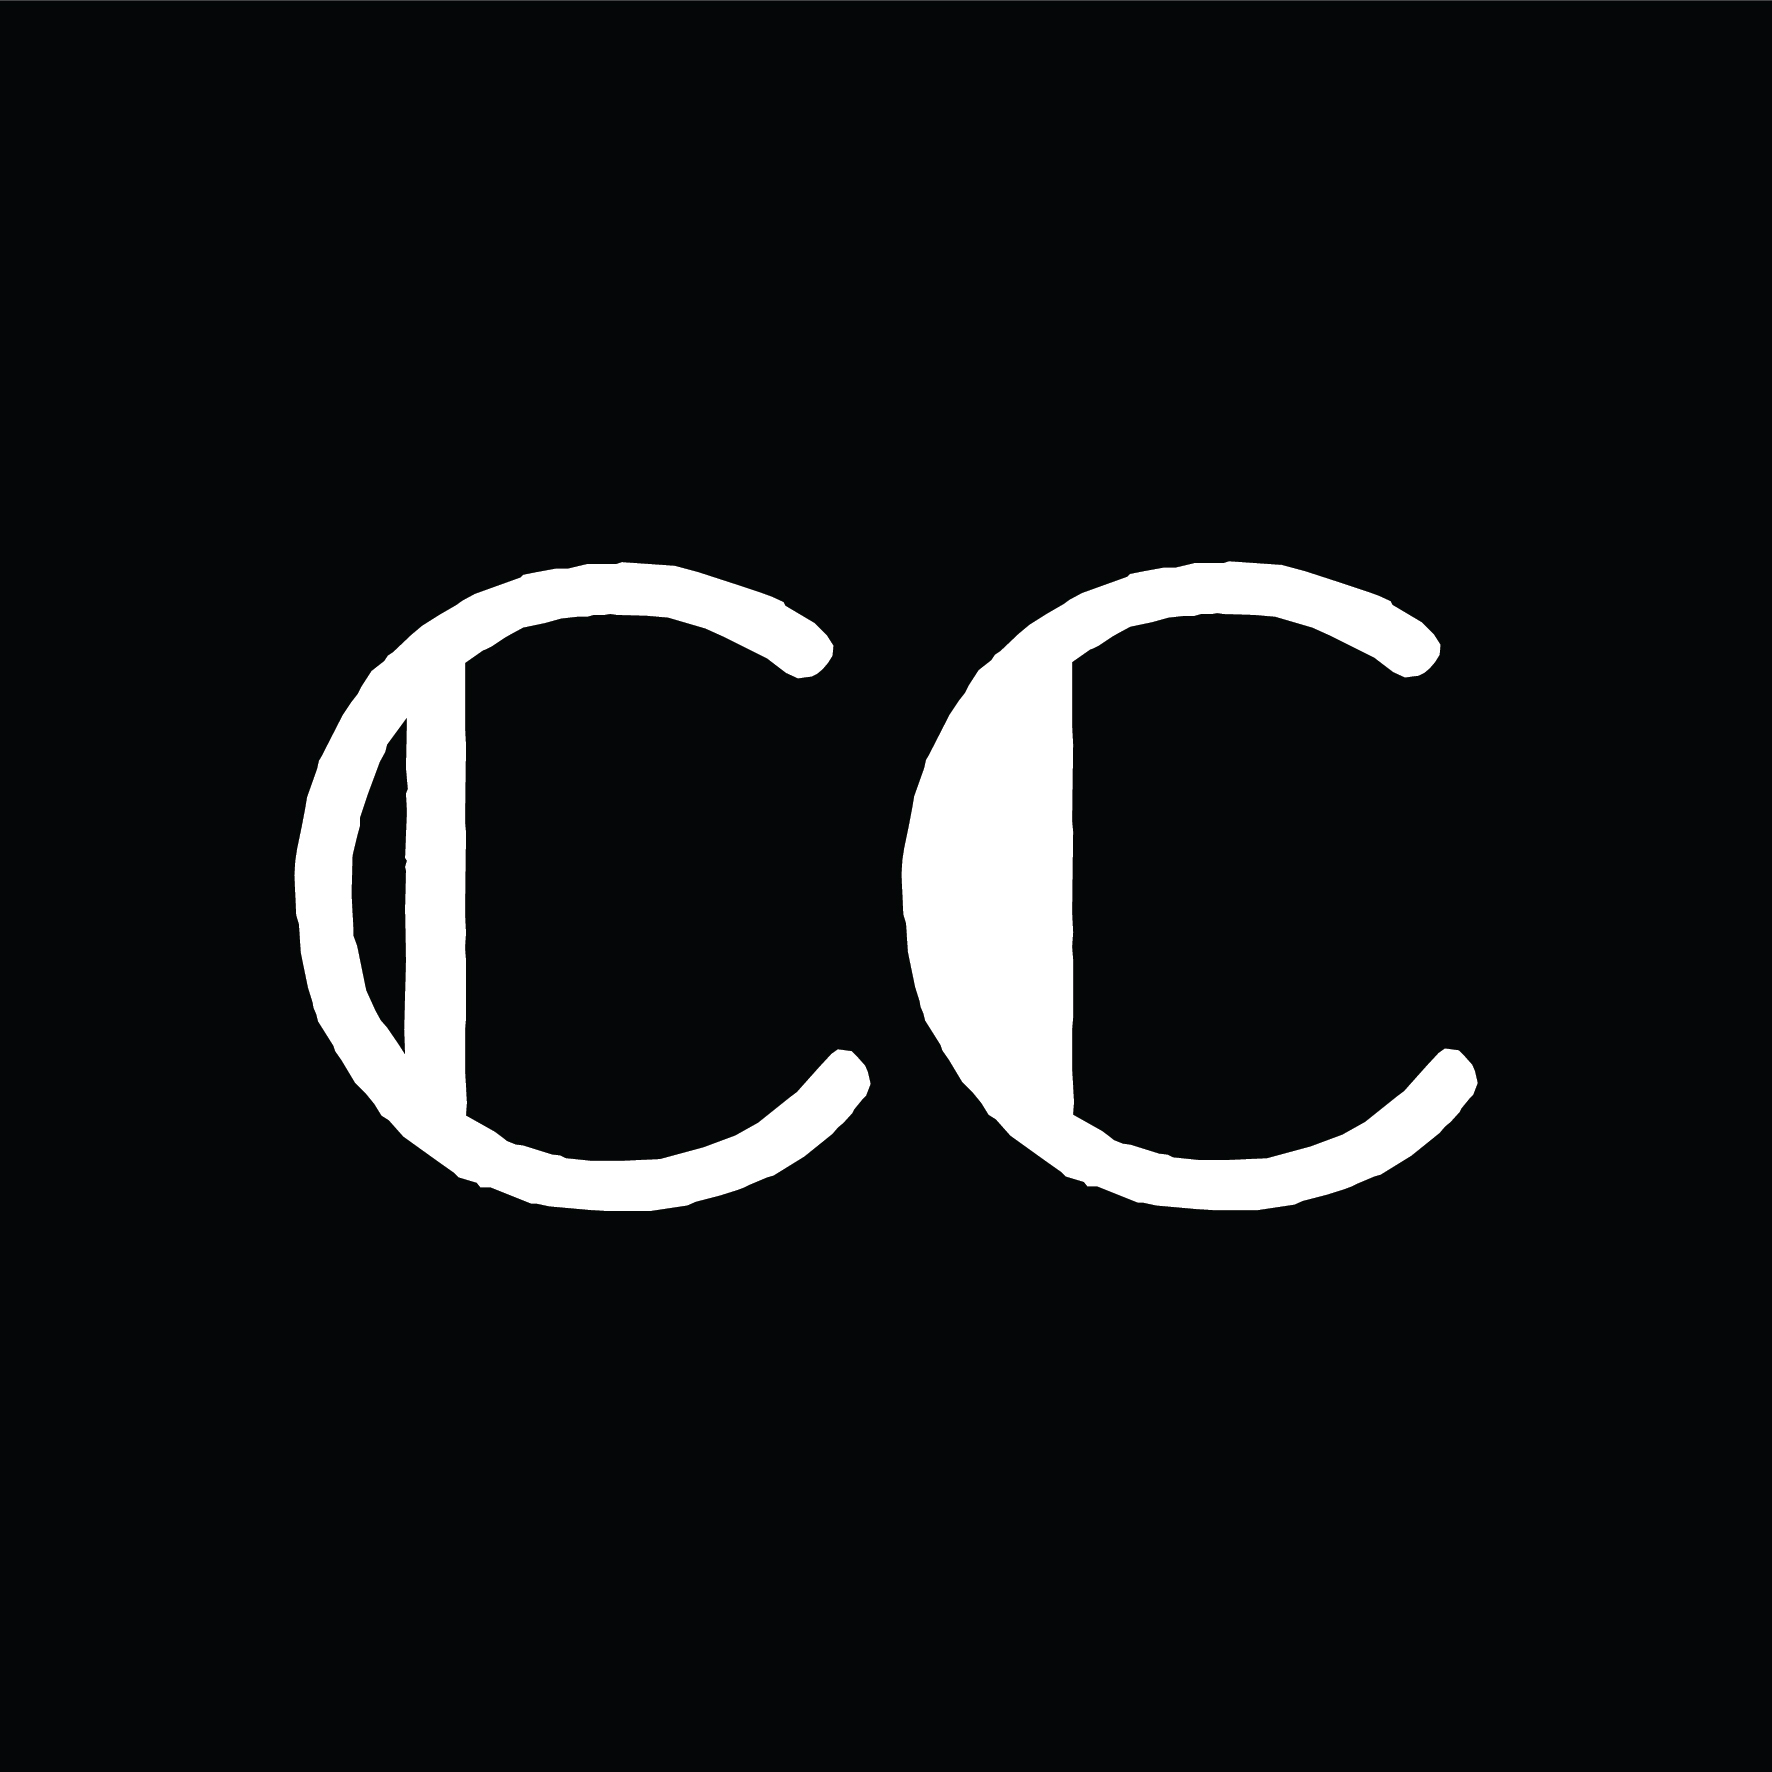 CC-LogoMark-1_Logo Mark - reverse.jpg